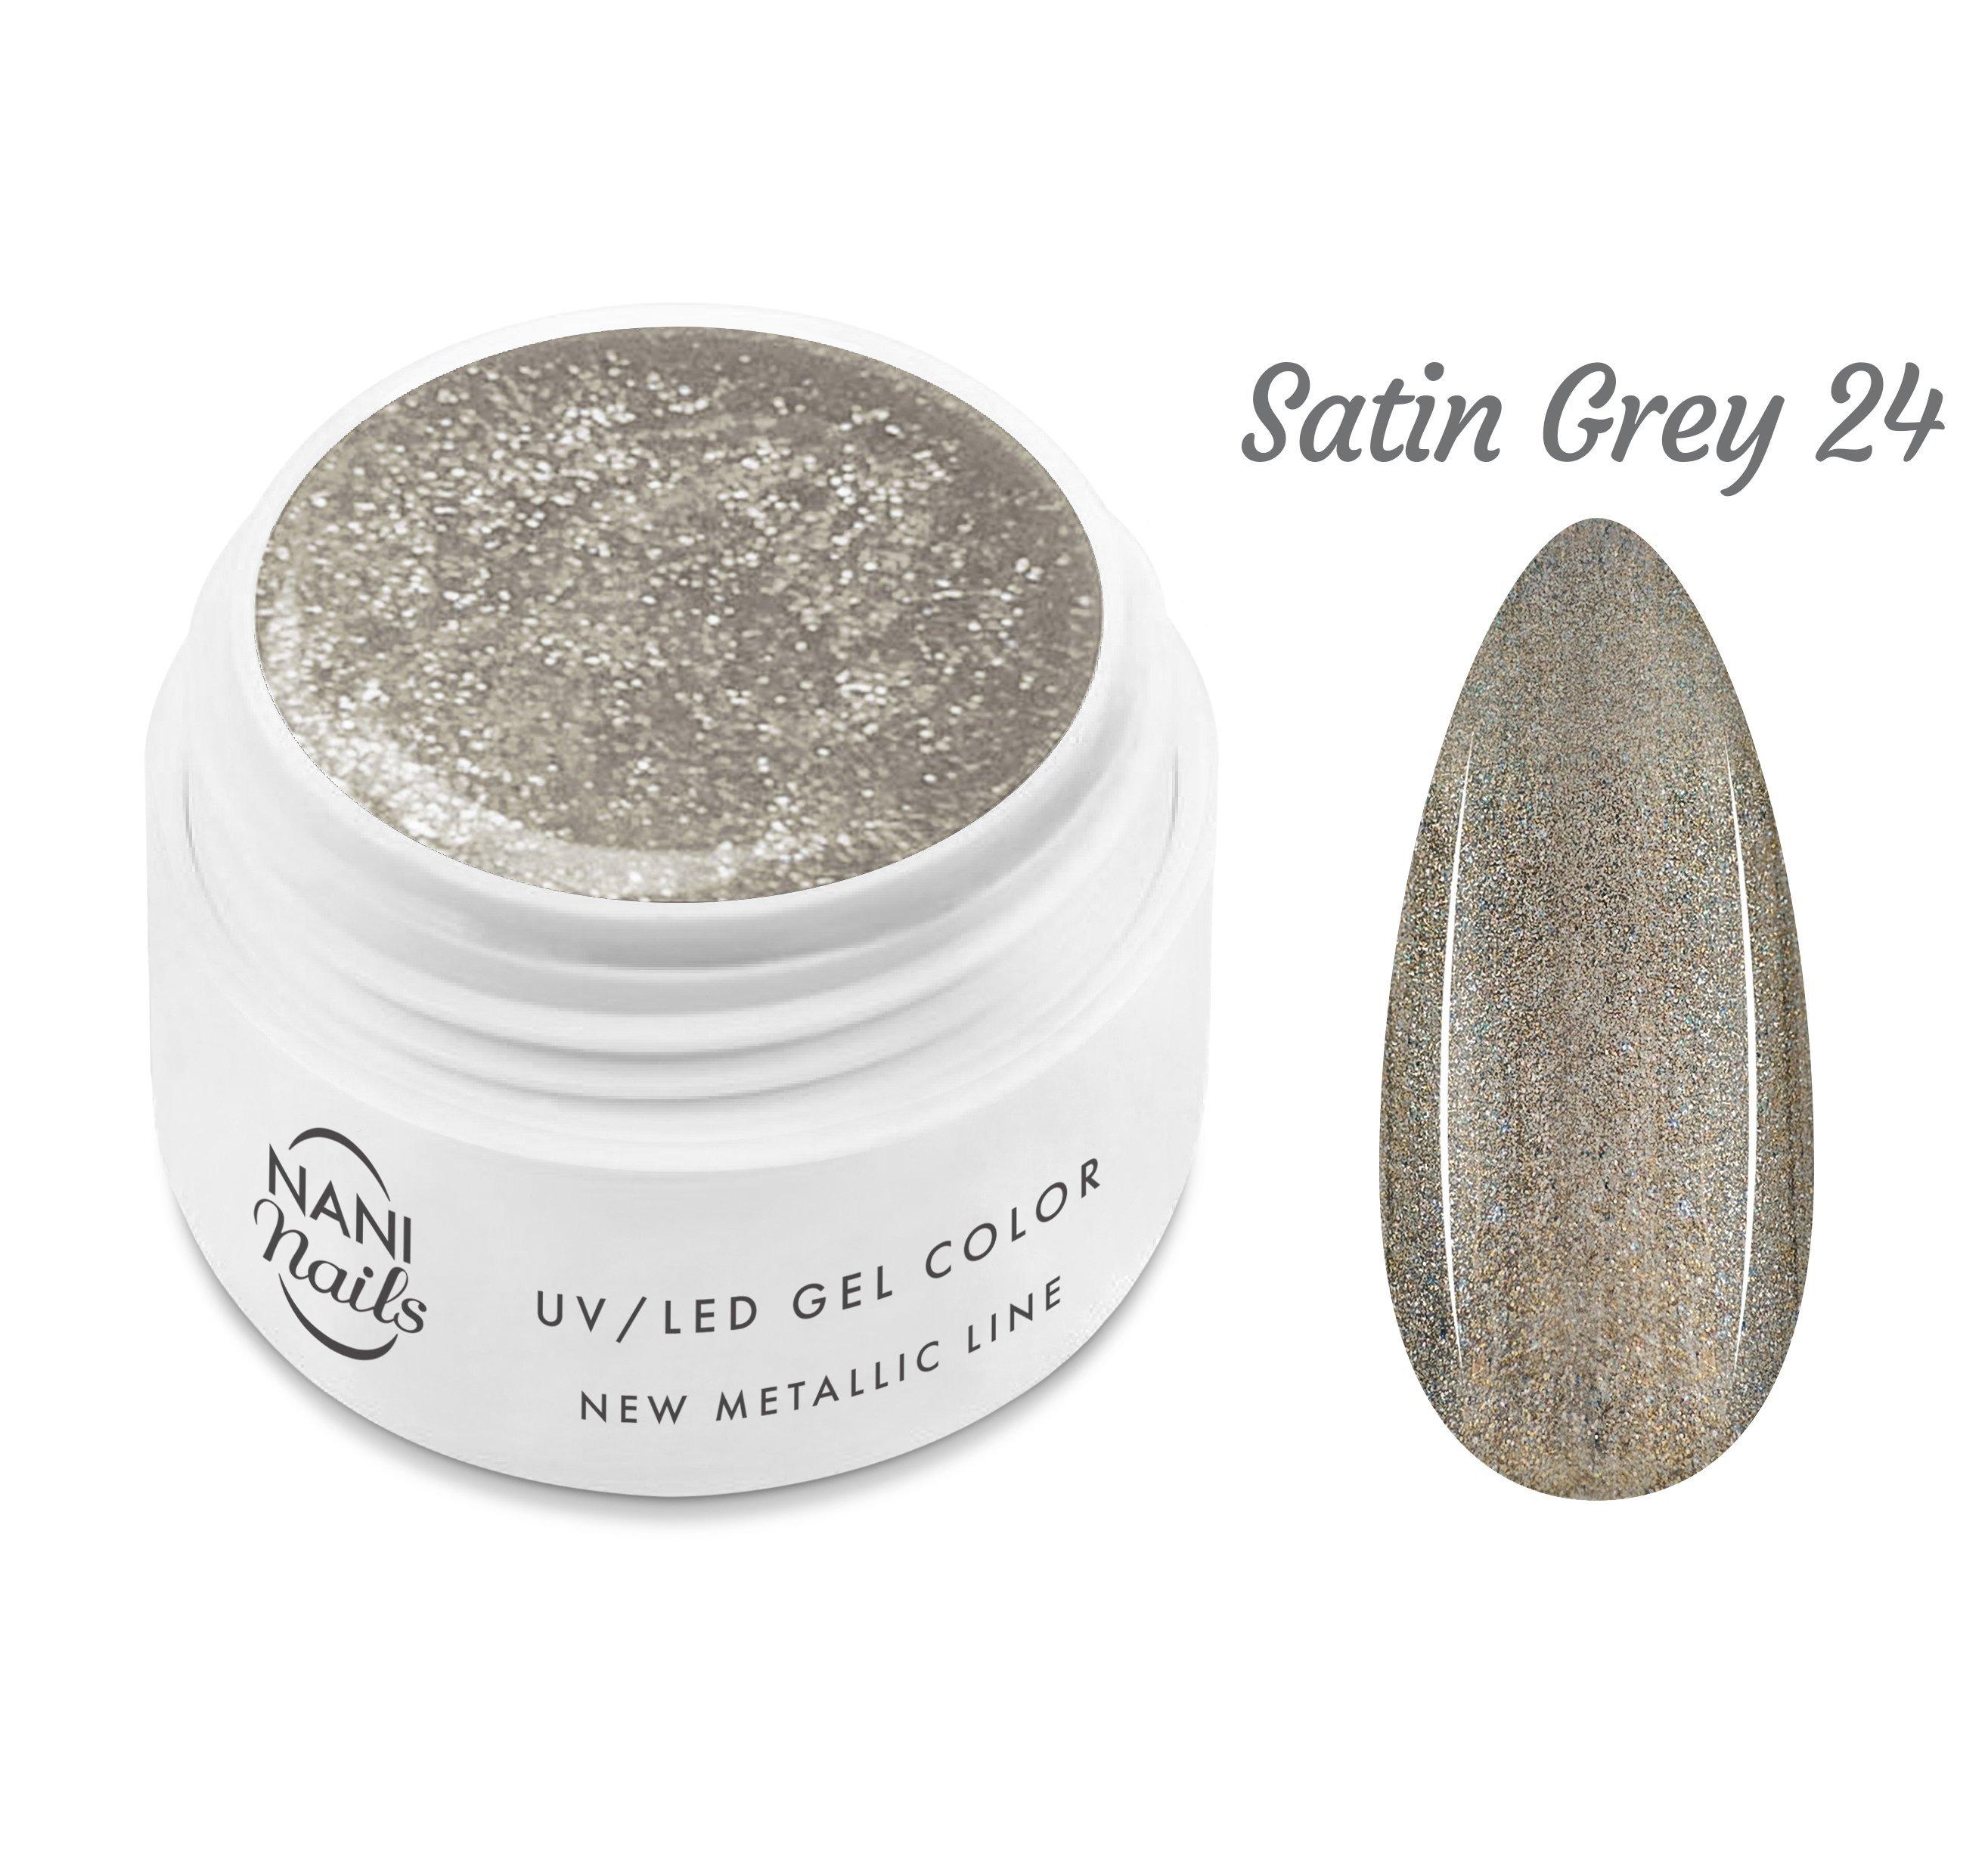 NANI UV gél New Metallic Line 5 ml - Satin Grey